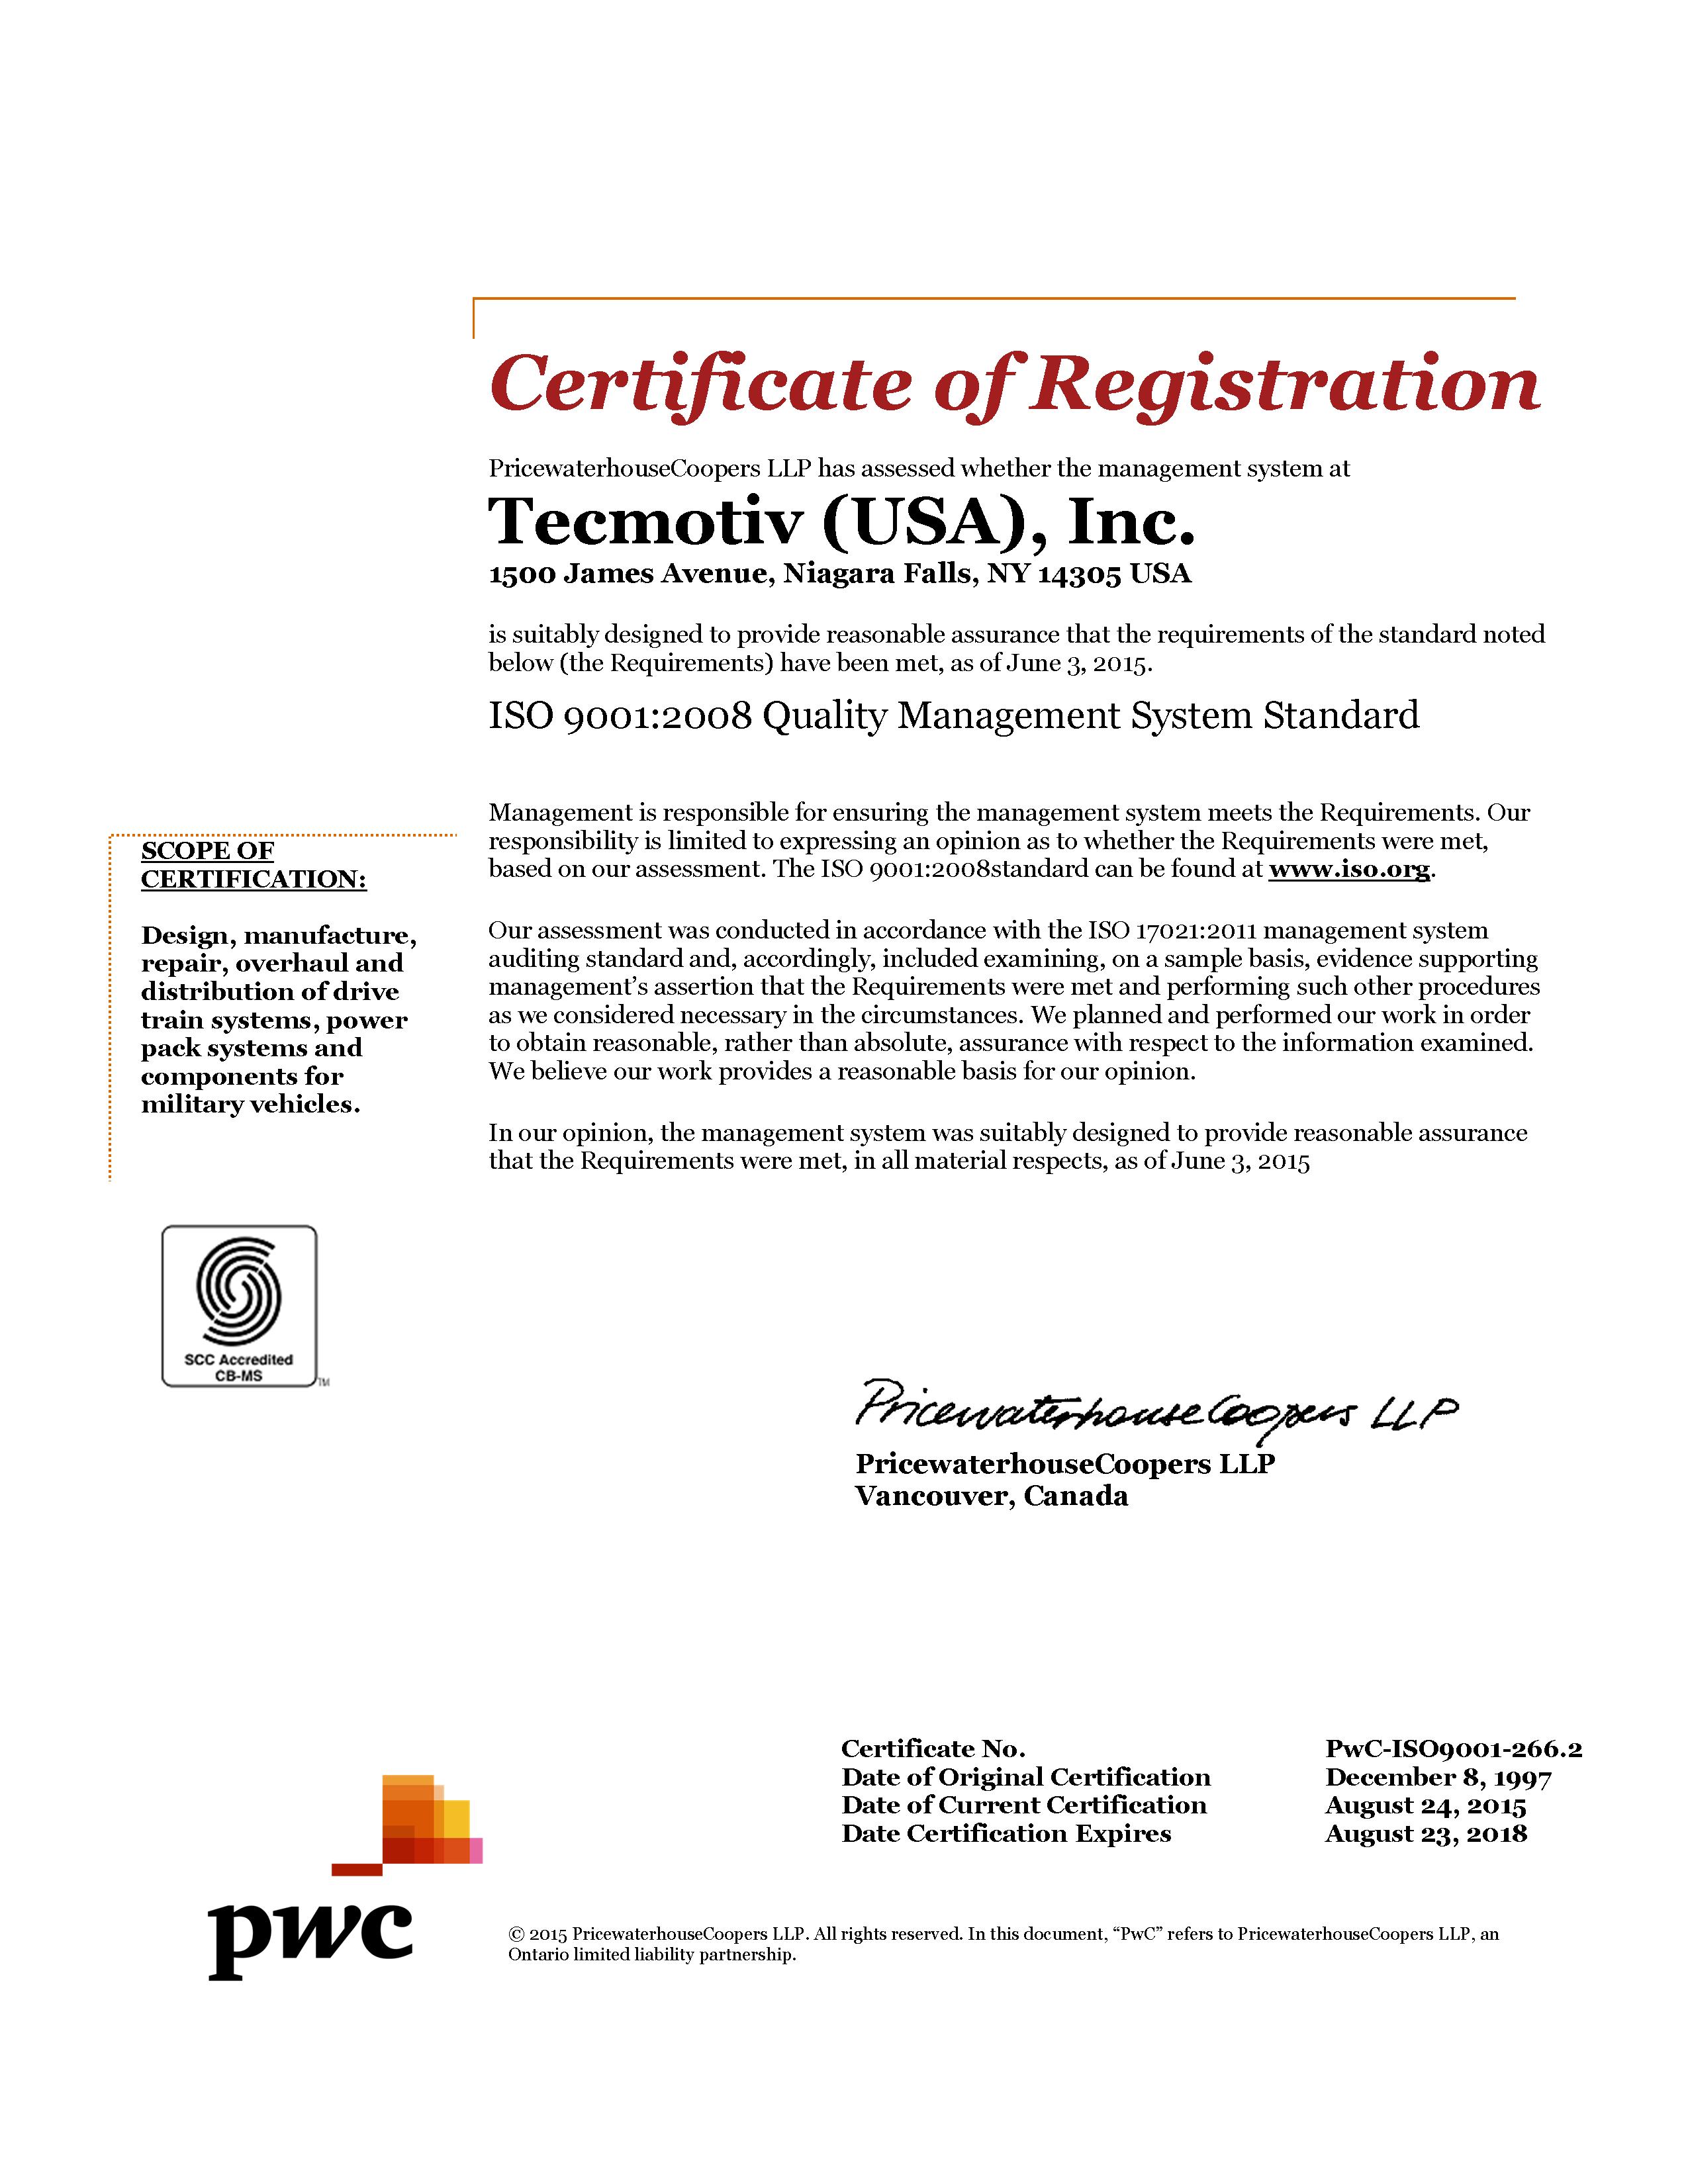 Tecmotiv (USA), Inc – ISO 9001:2008 Certification